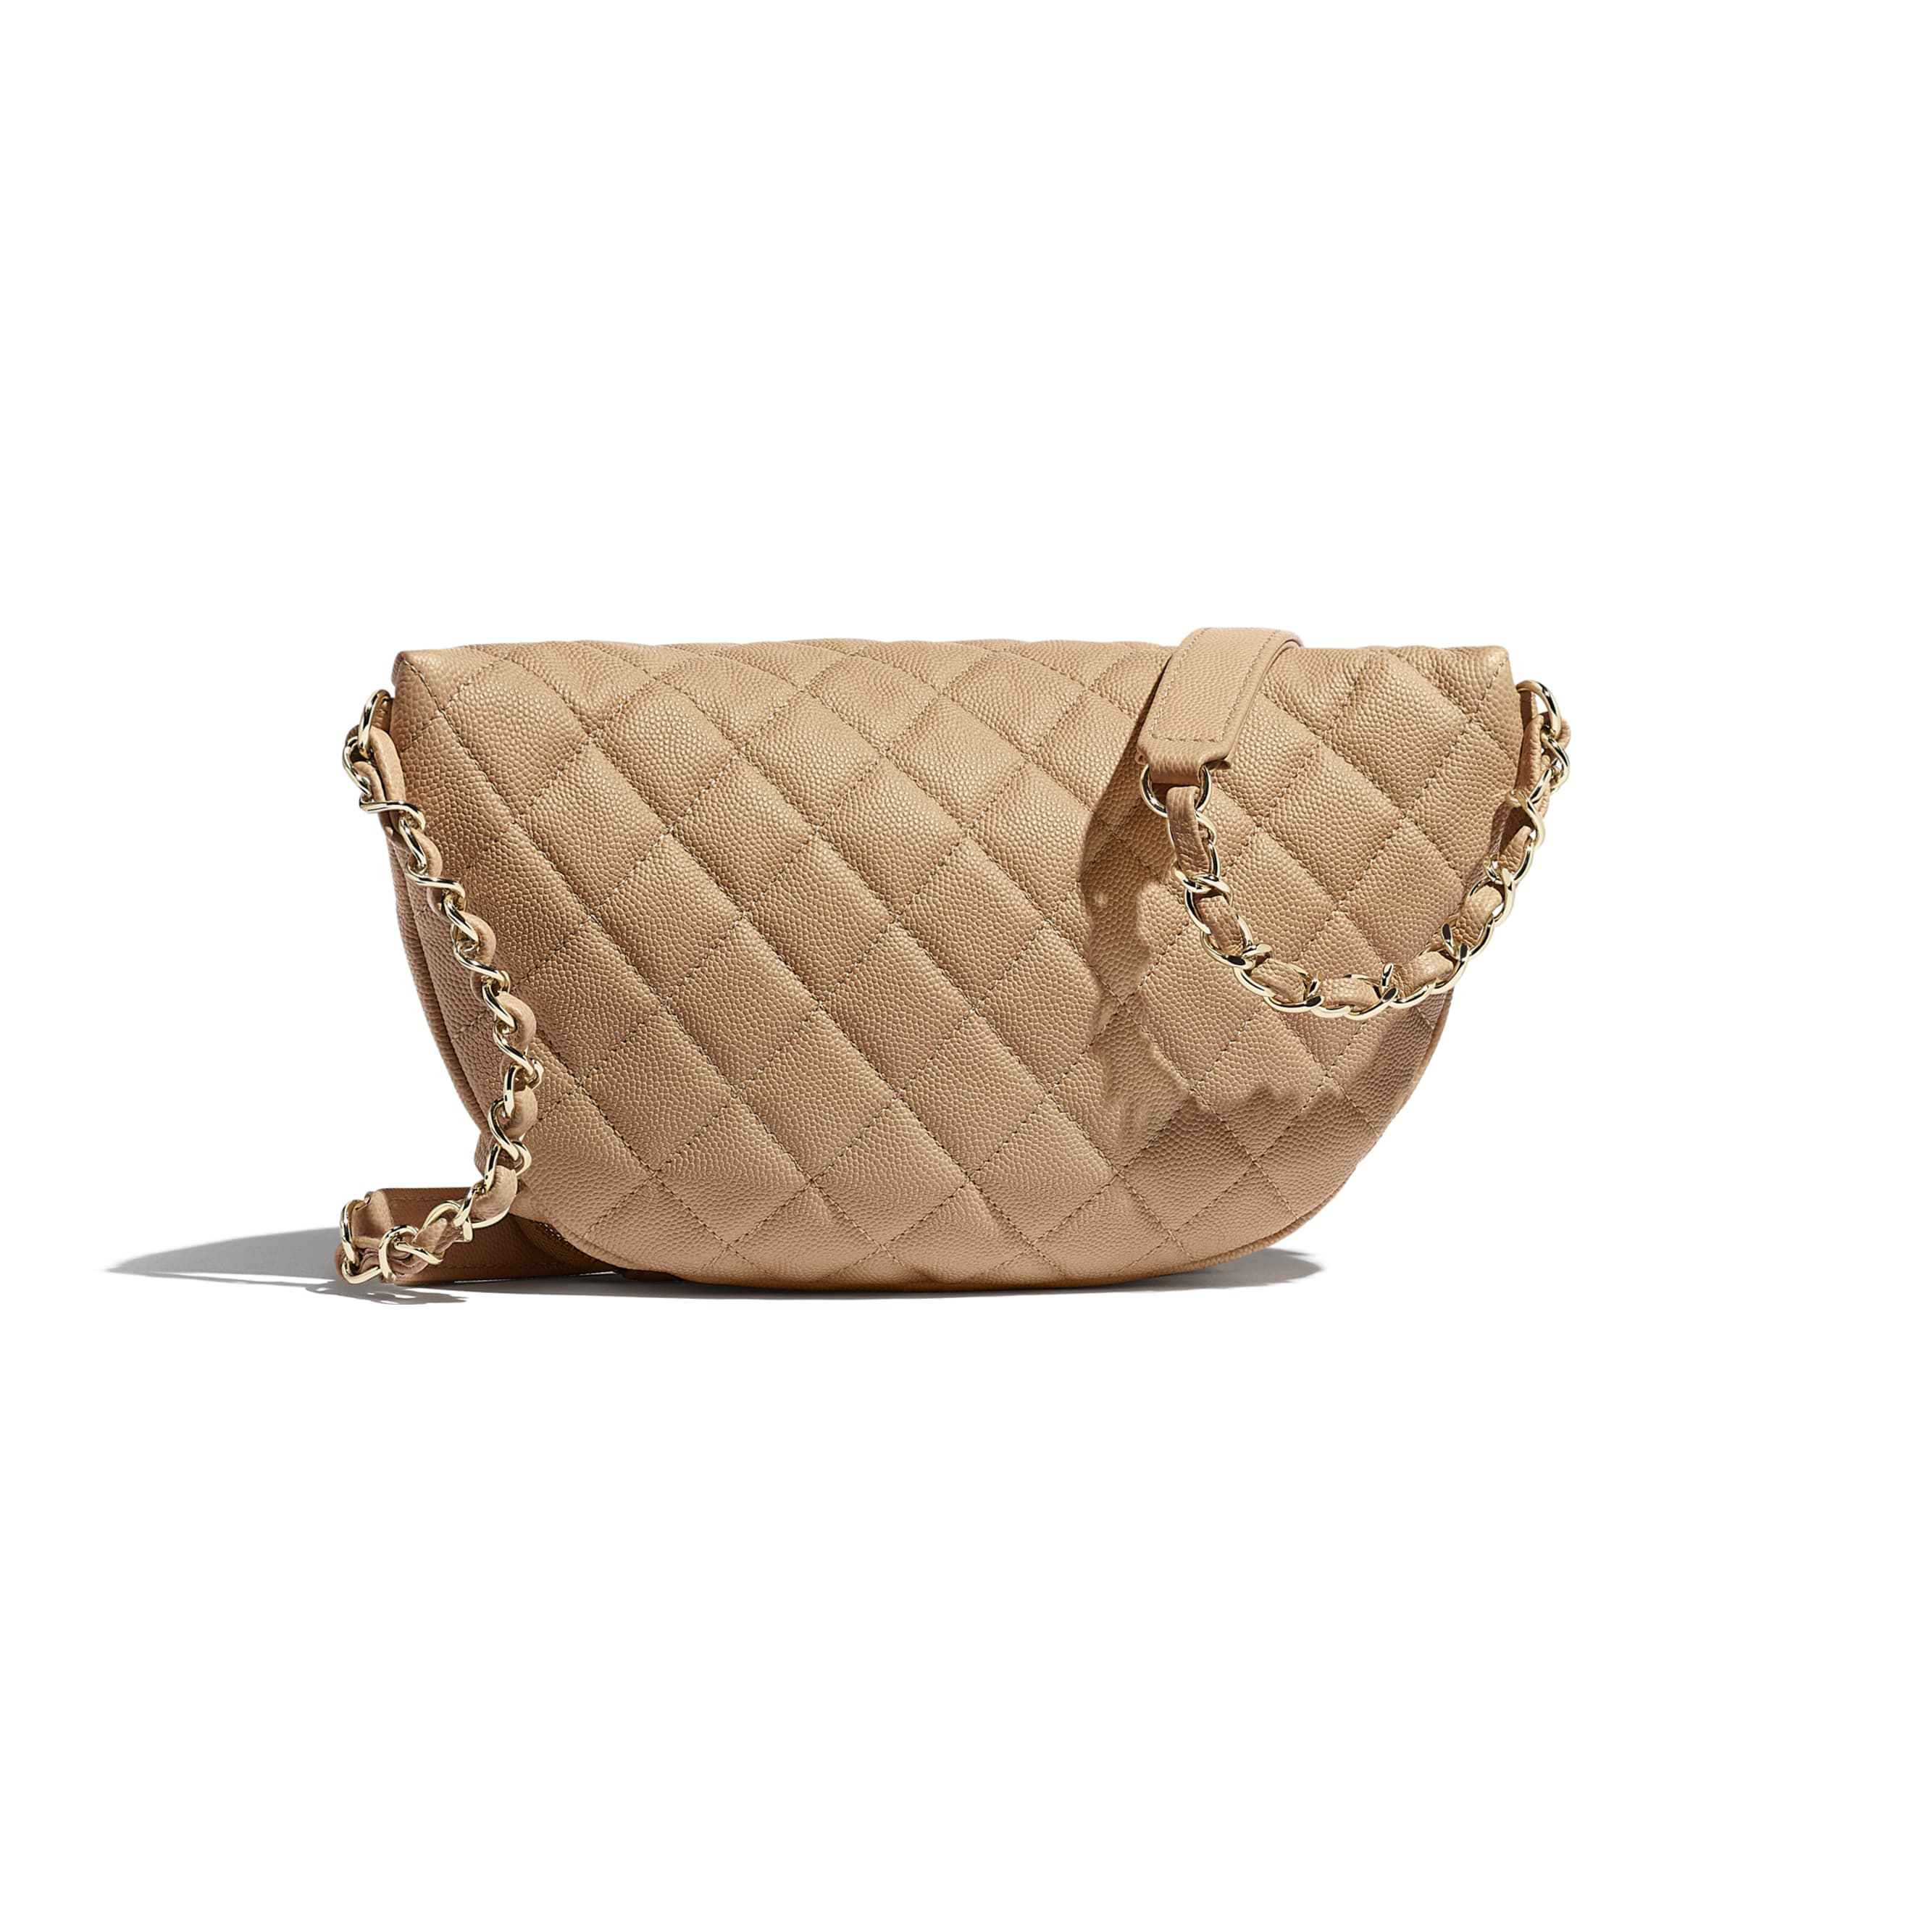 Waist Bag - Beige - Grained Calfskin & Gold-Tone Metal - CHANEL - Alternative view - see standard sized version